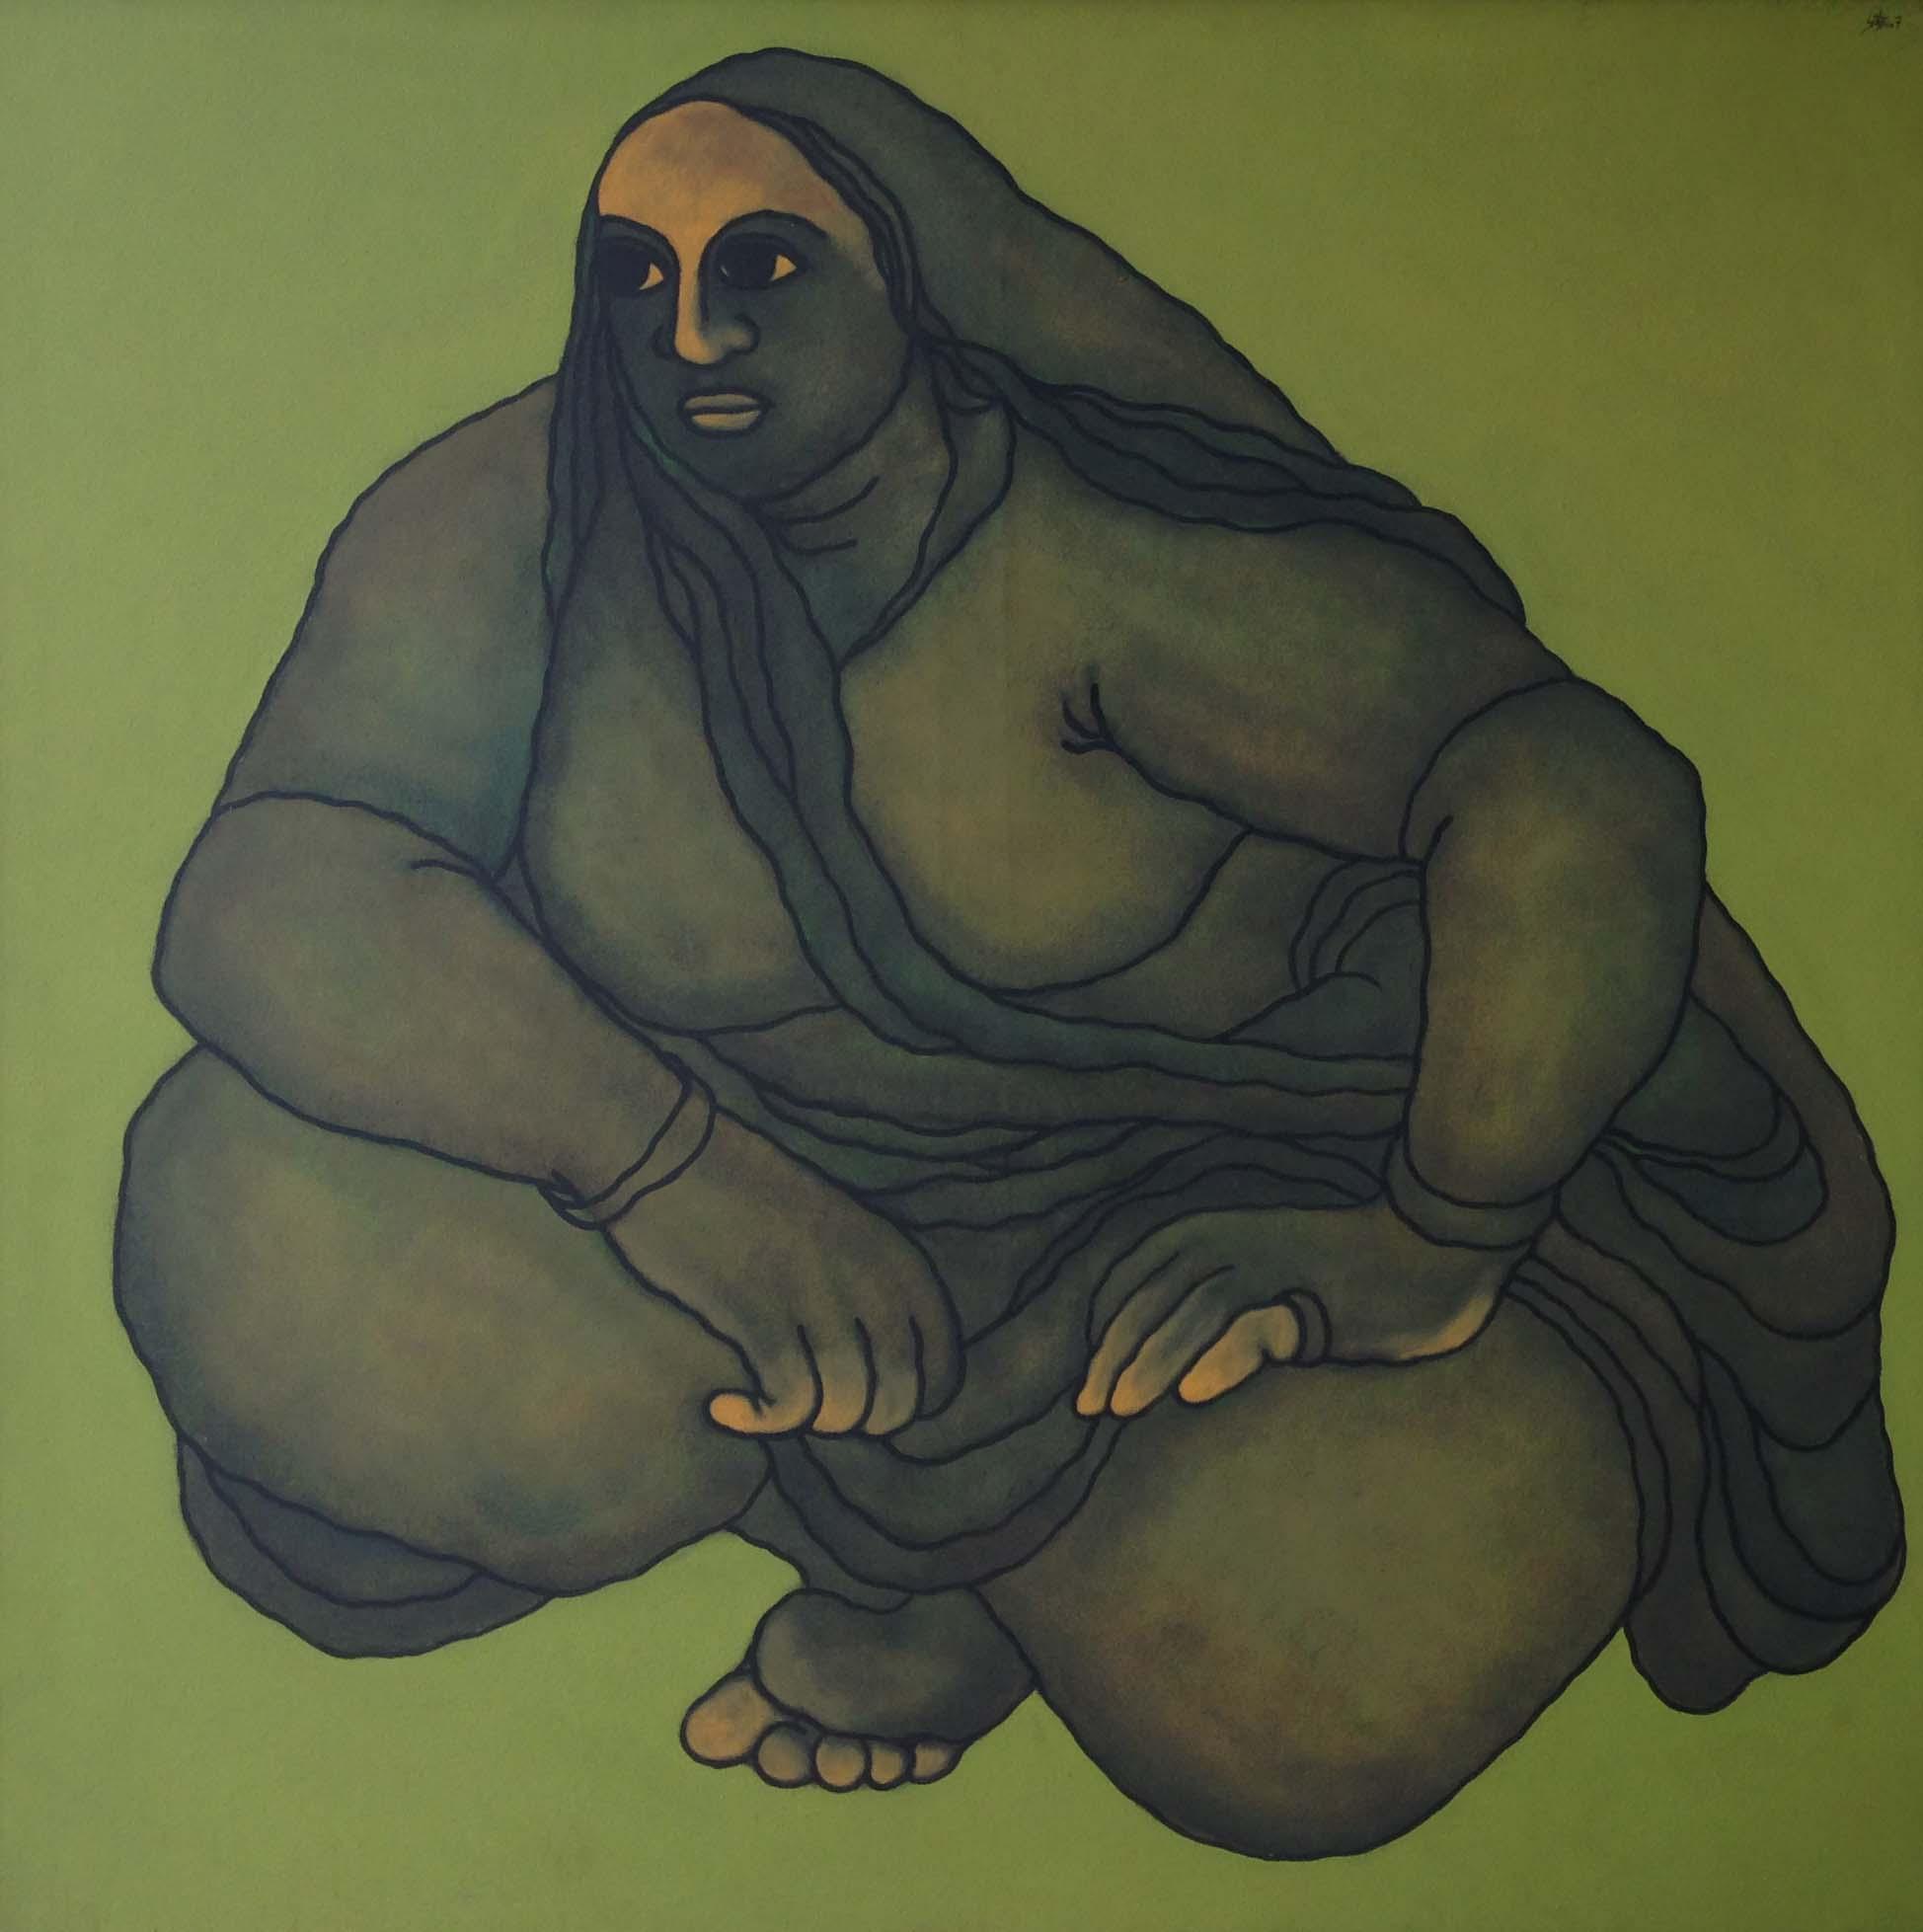 Pramod Ganapatye